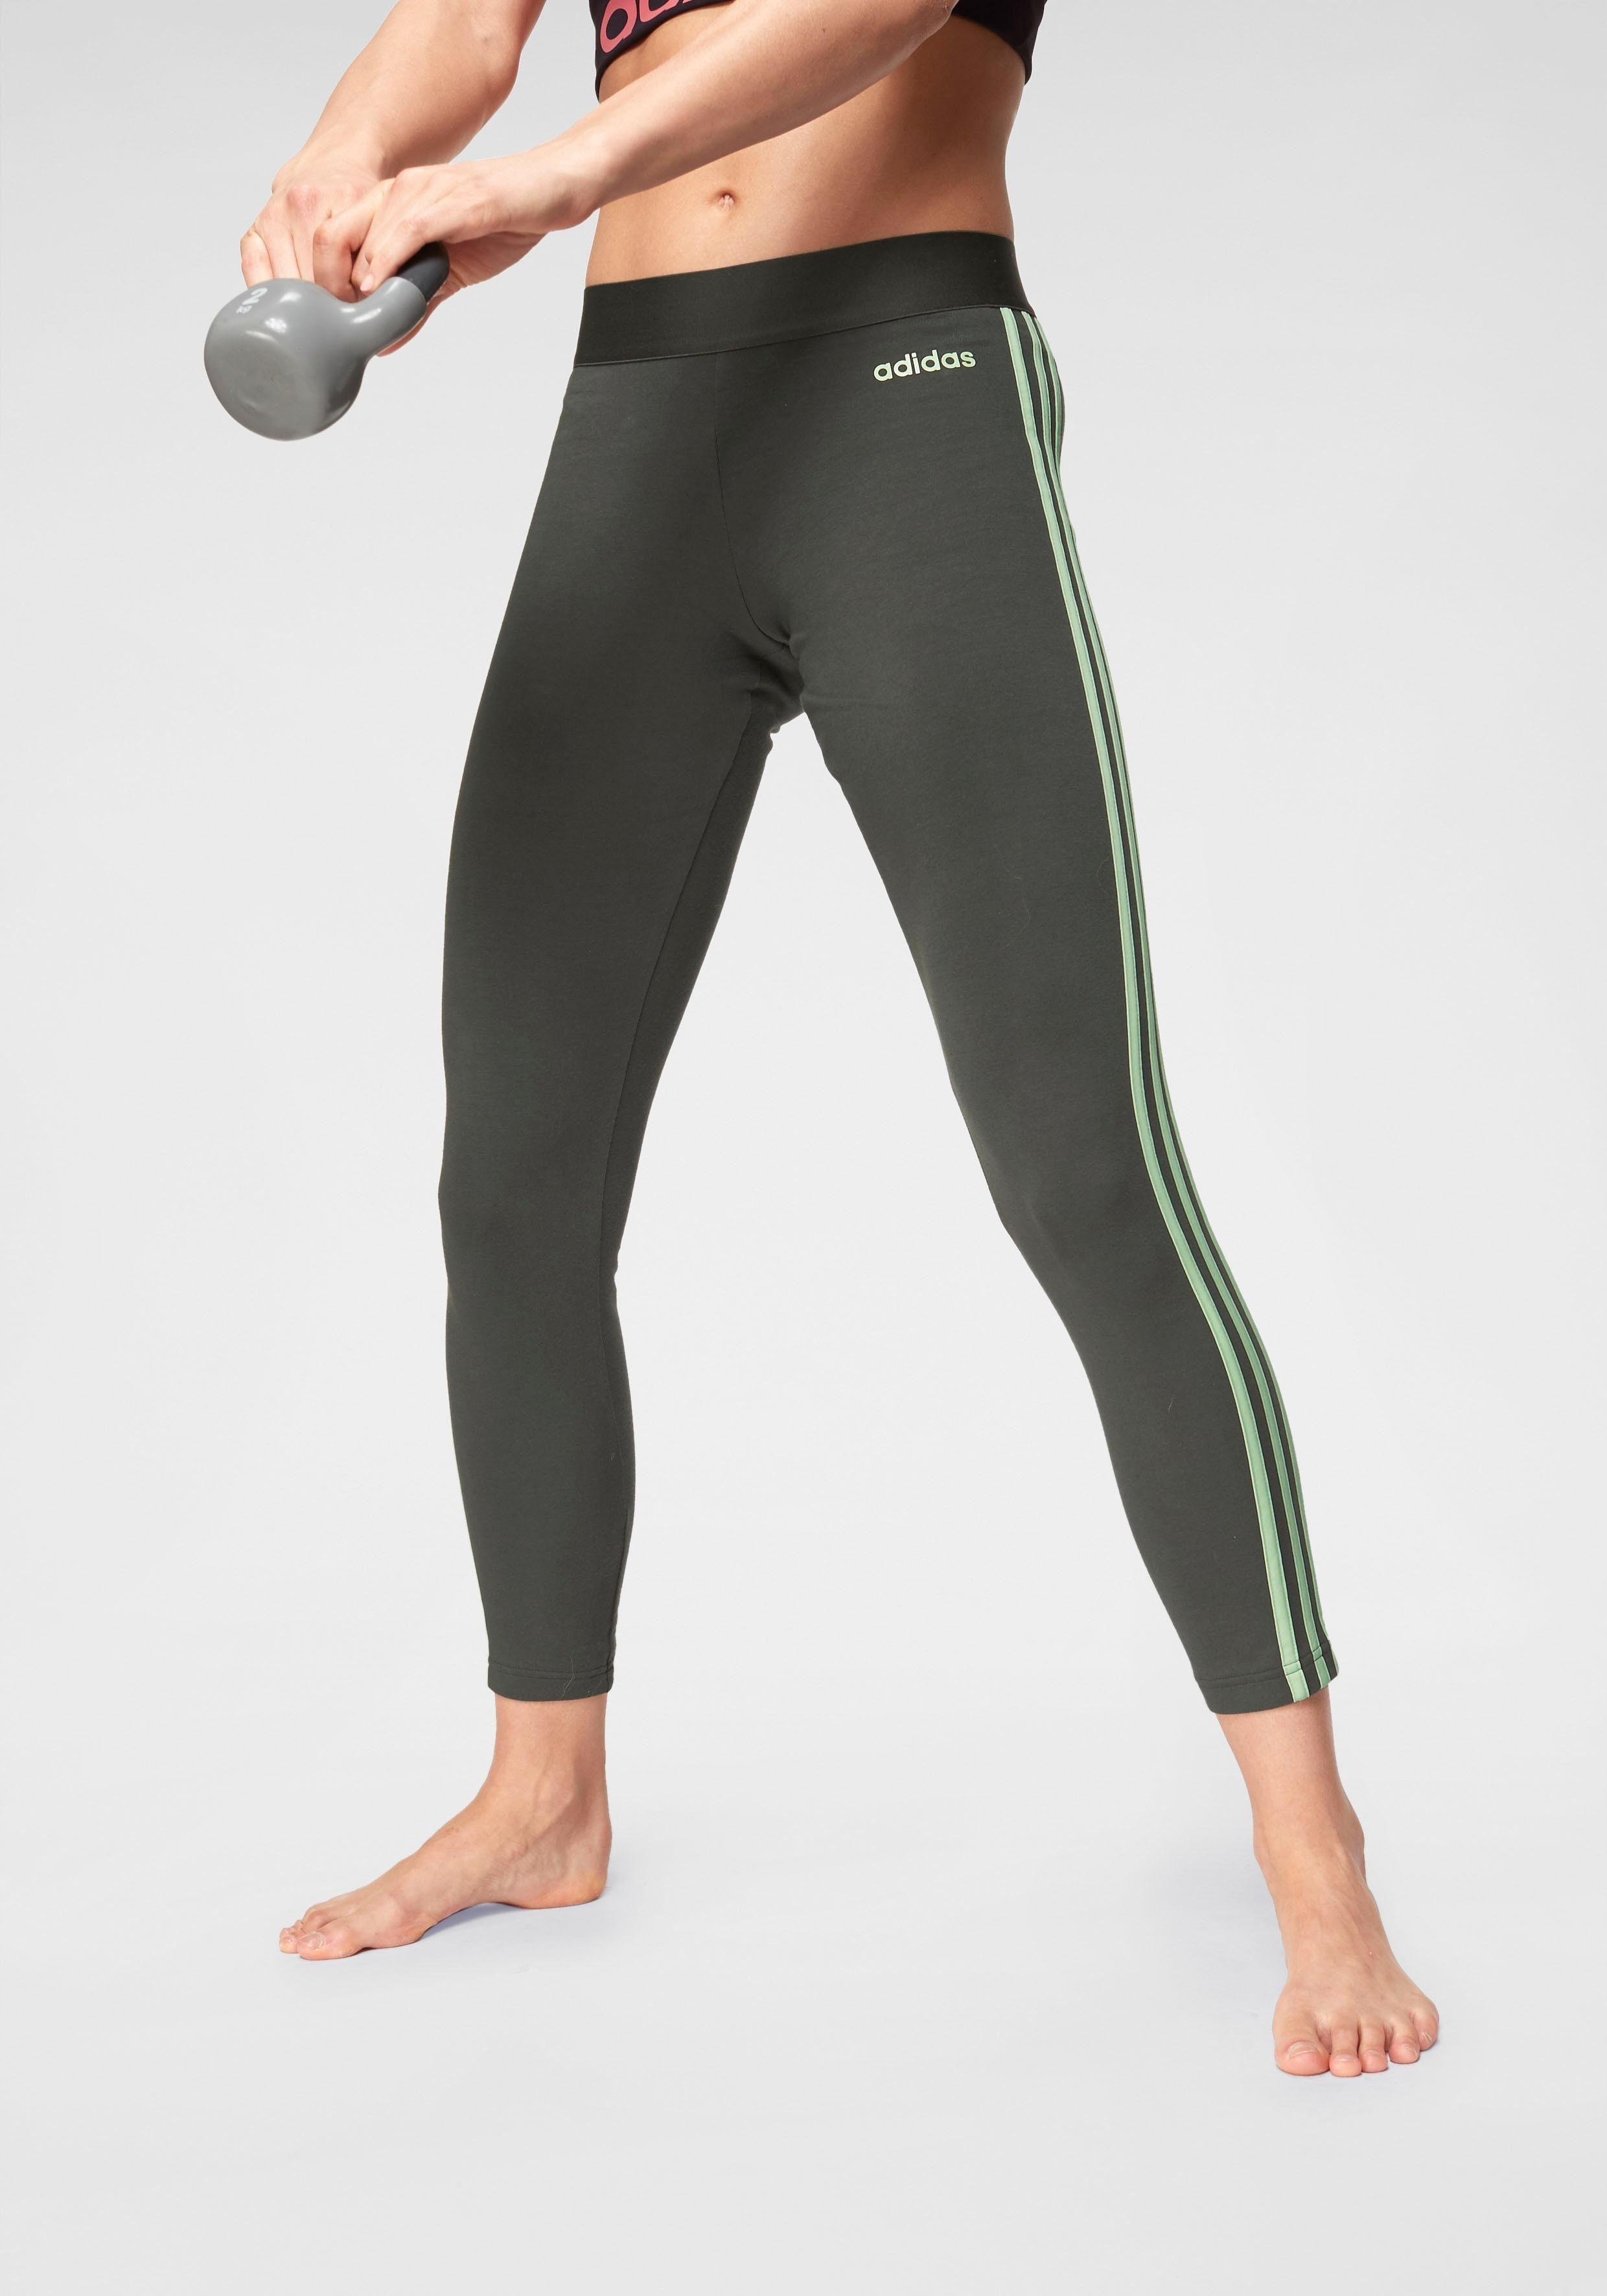 graphic tights leggings hosen adidas